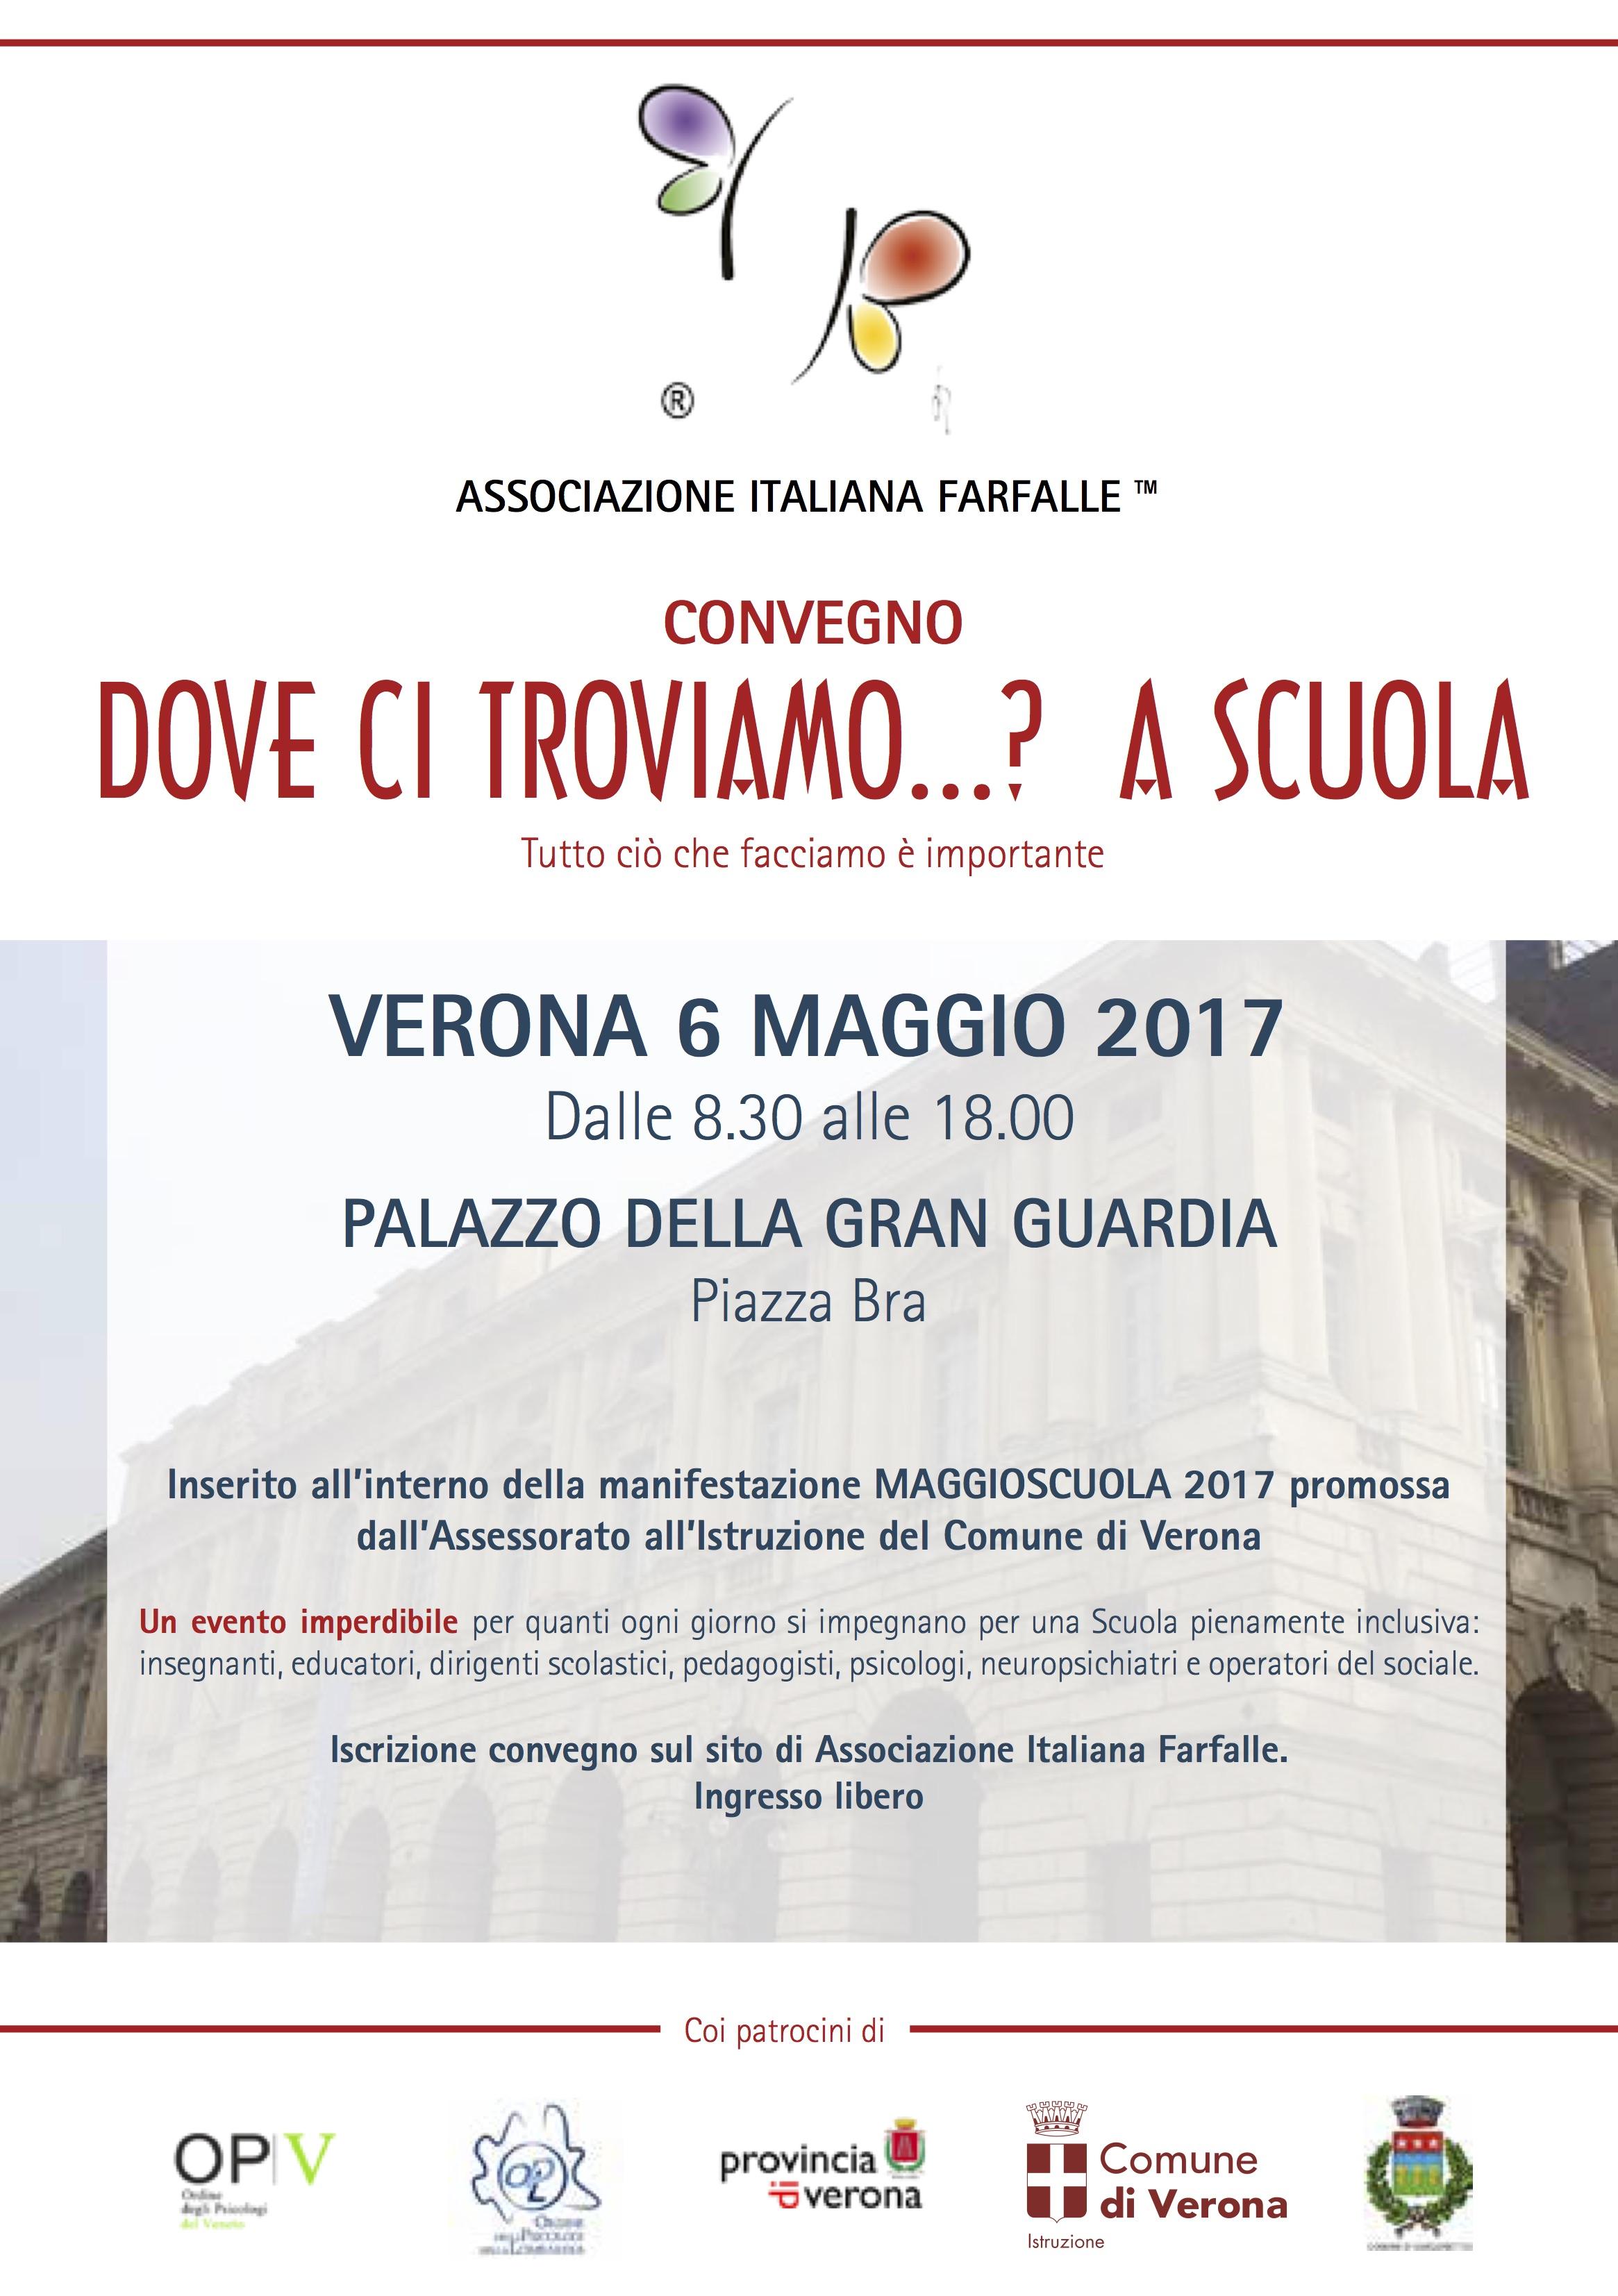 6 Maggio: convegno a Verona